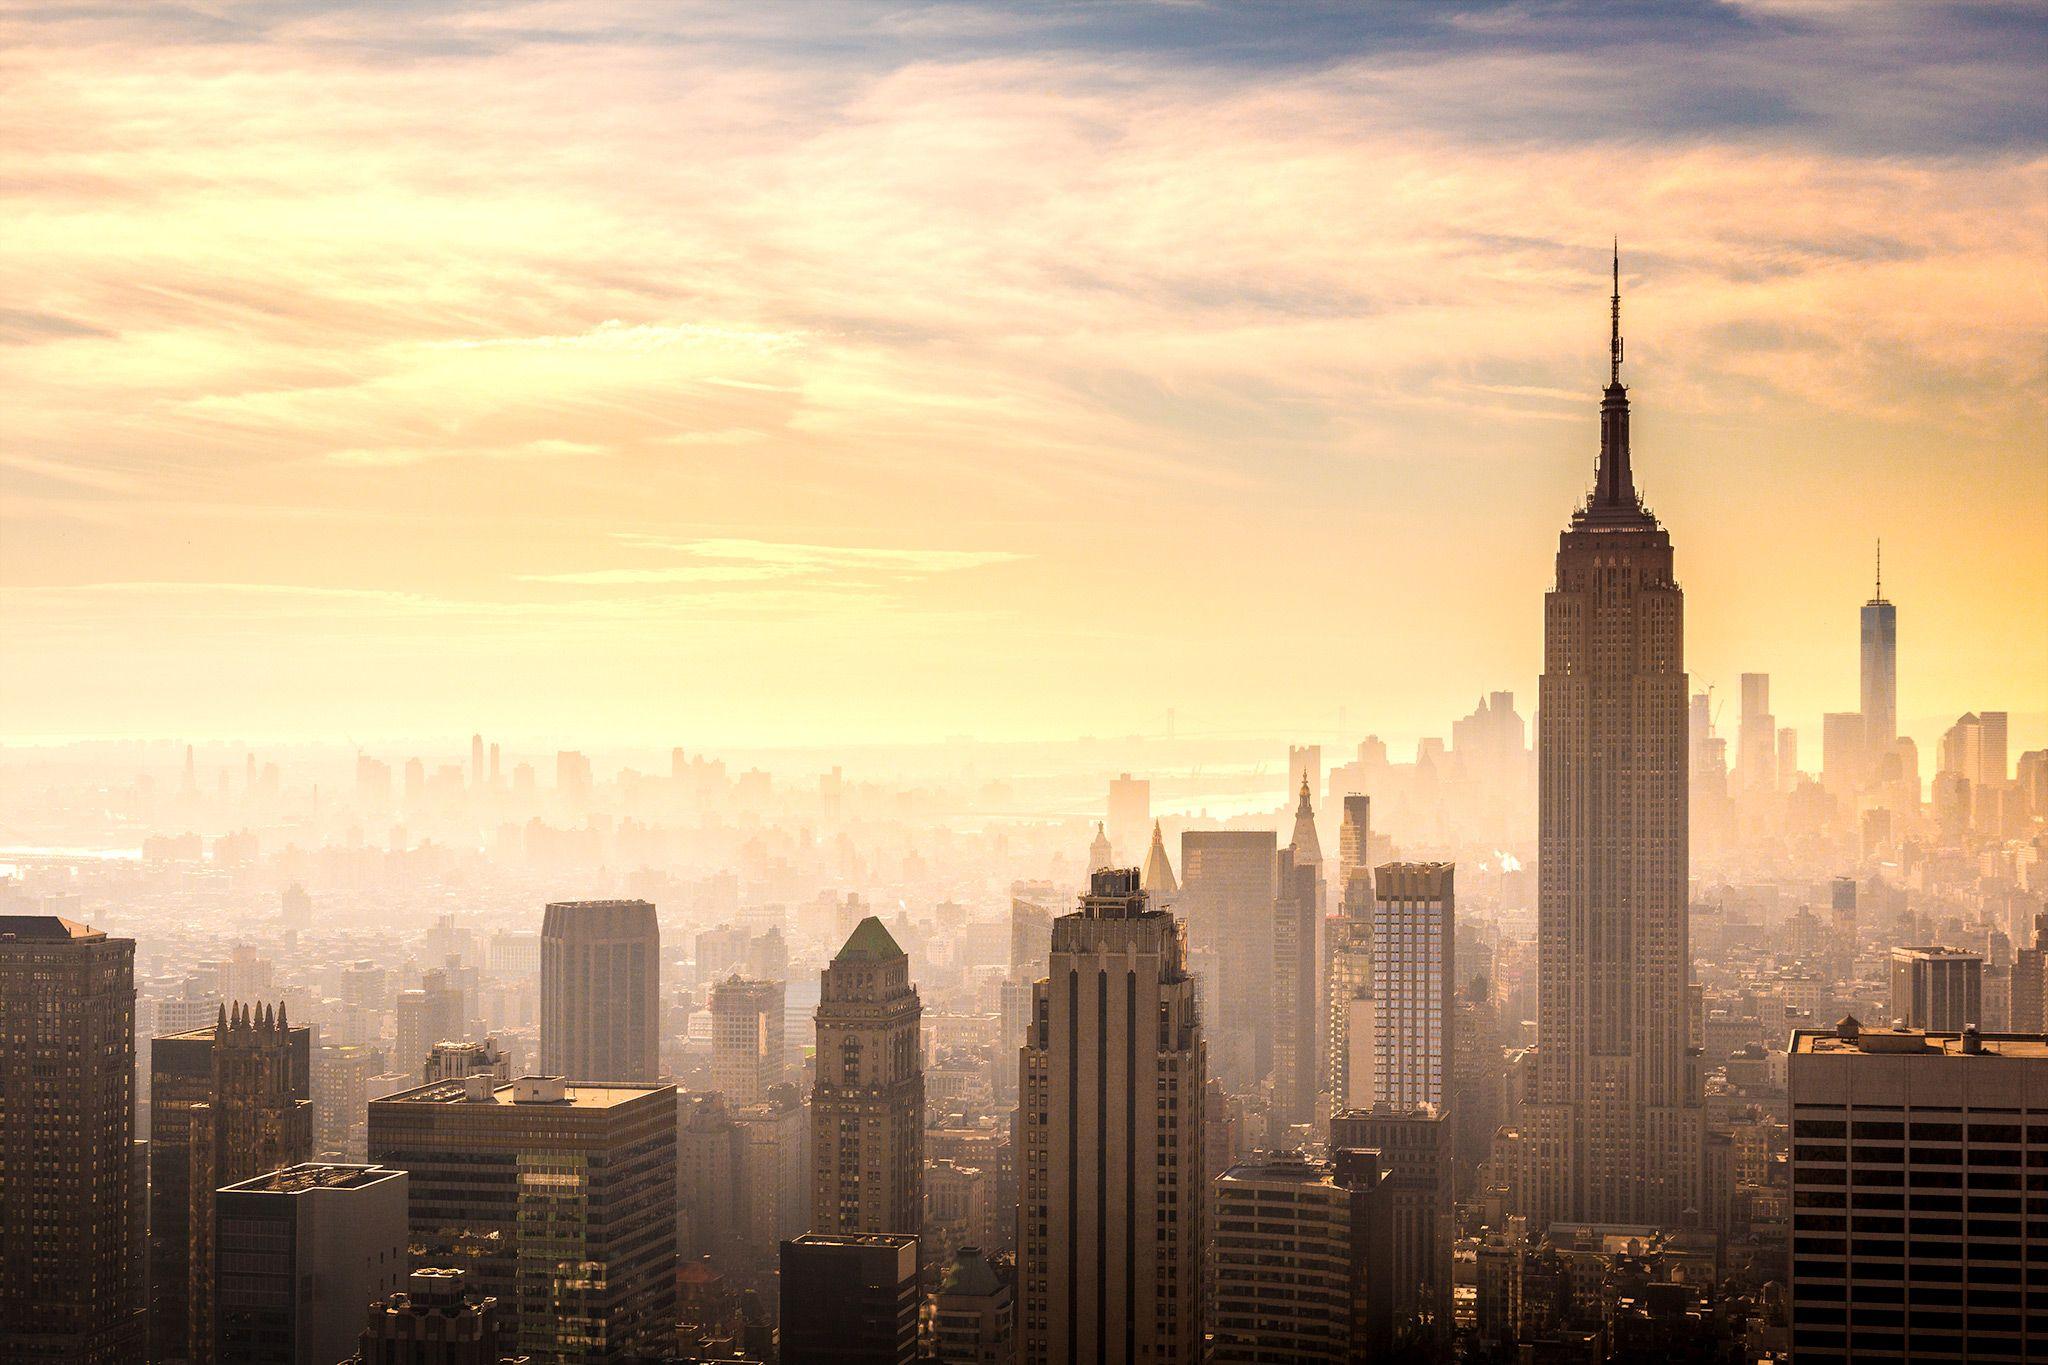 Pin On Ipad Pro Others Wallpaper: [OC]Orange Hues Over Manhattan NY [2048x1365]. Wallpaper